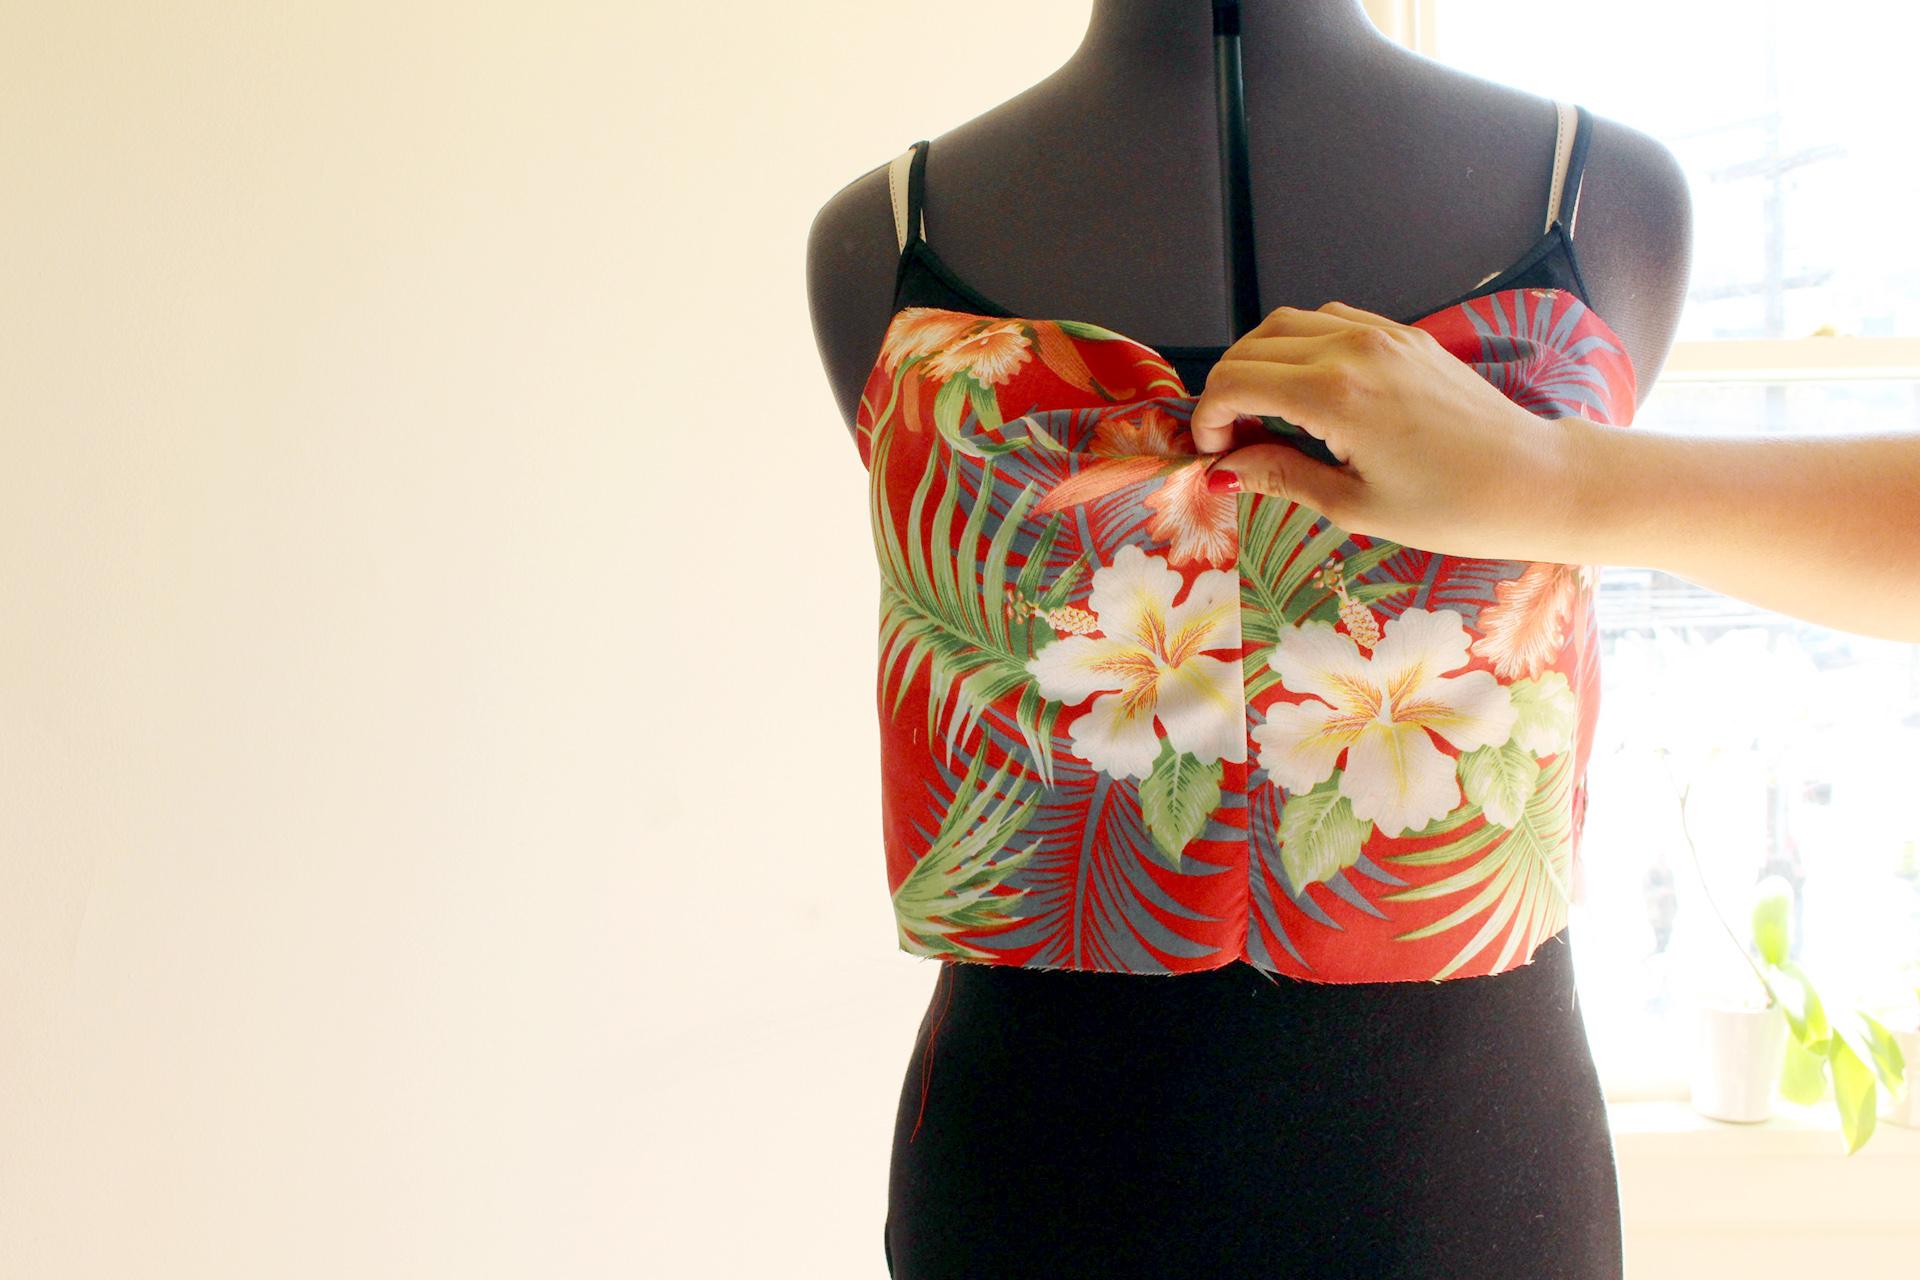 Gertie Tiki Dress, Gertie's New Book for Better Sewing, in progress bodice | @vintageontap